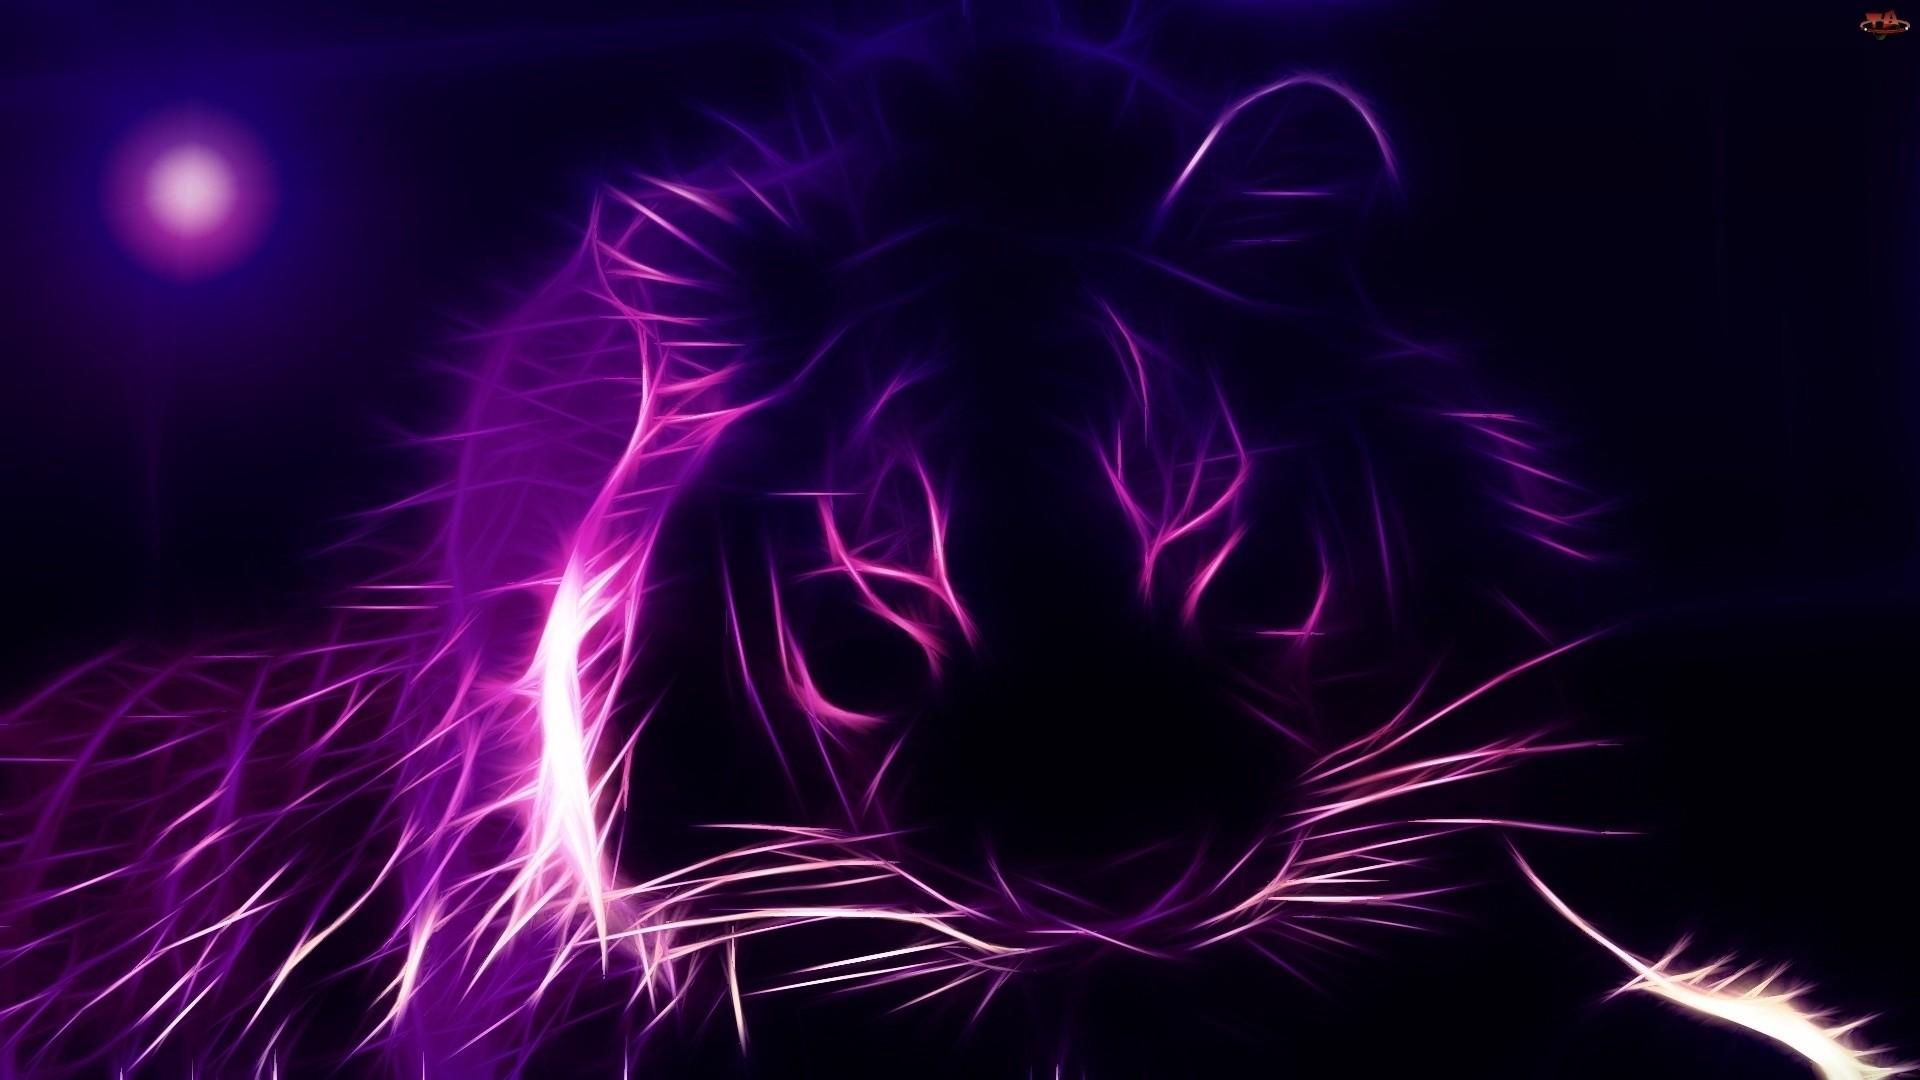 Explore Purple Wallpaper, Tiger Wallpaper, and more!